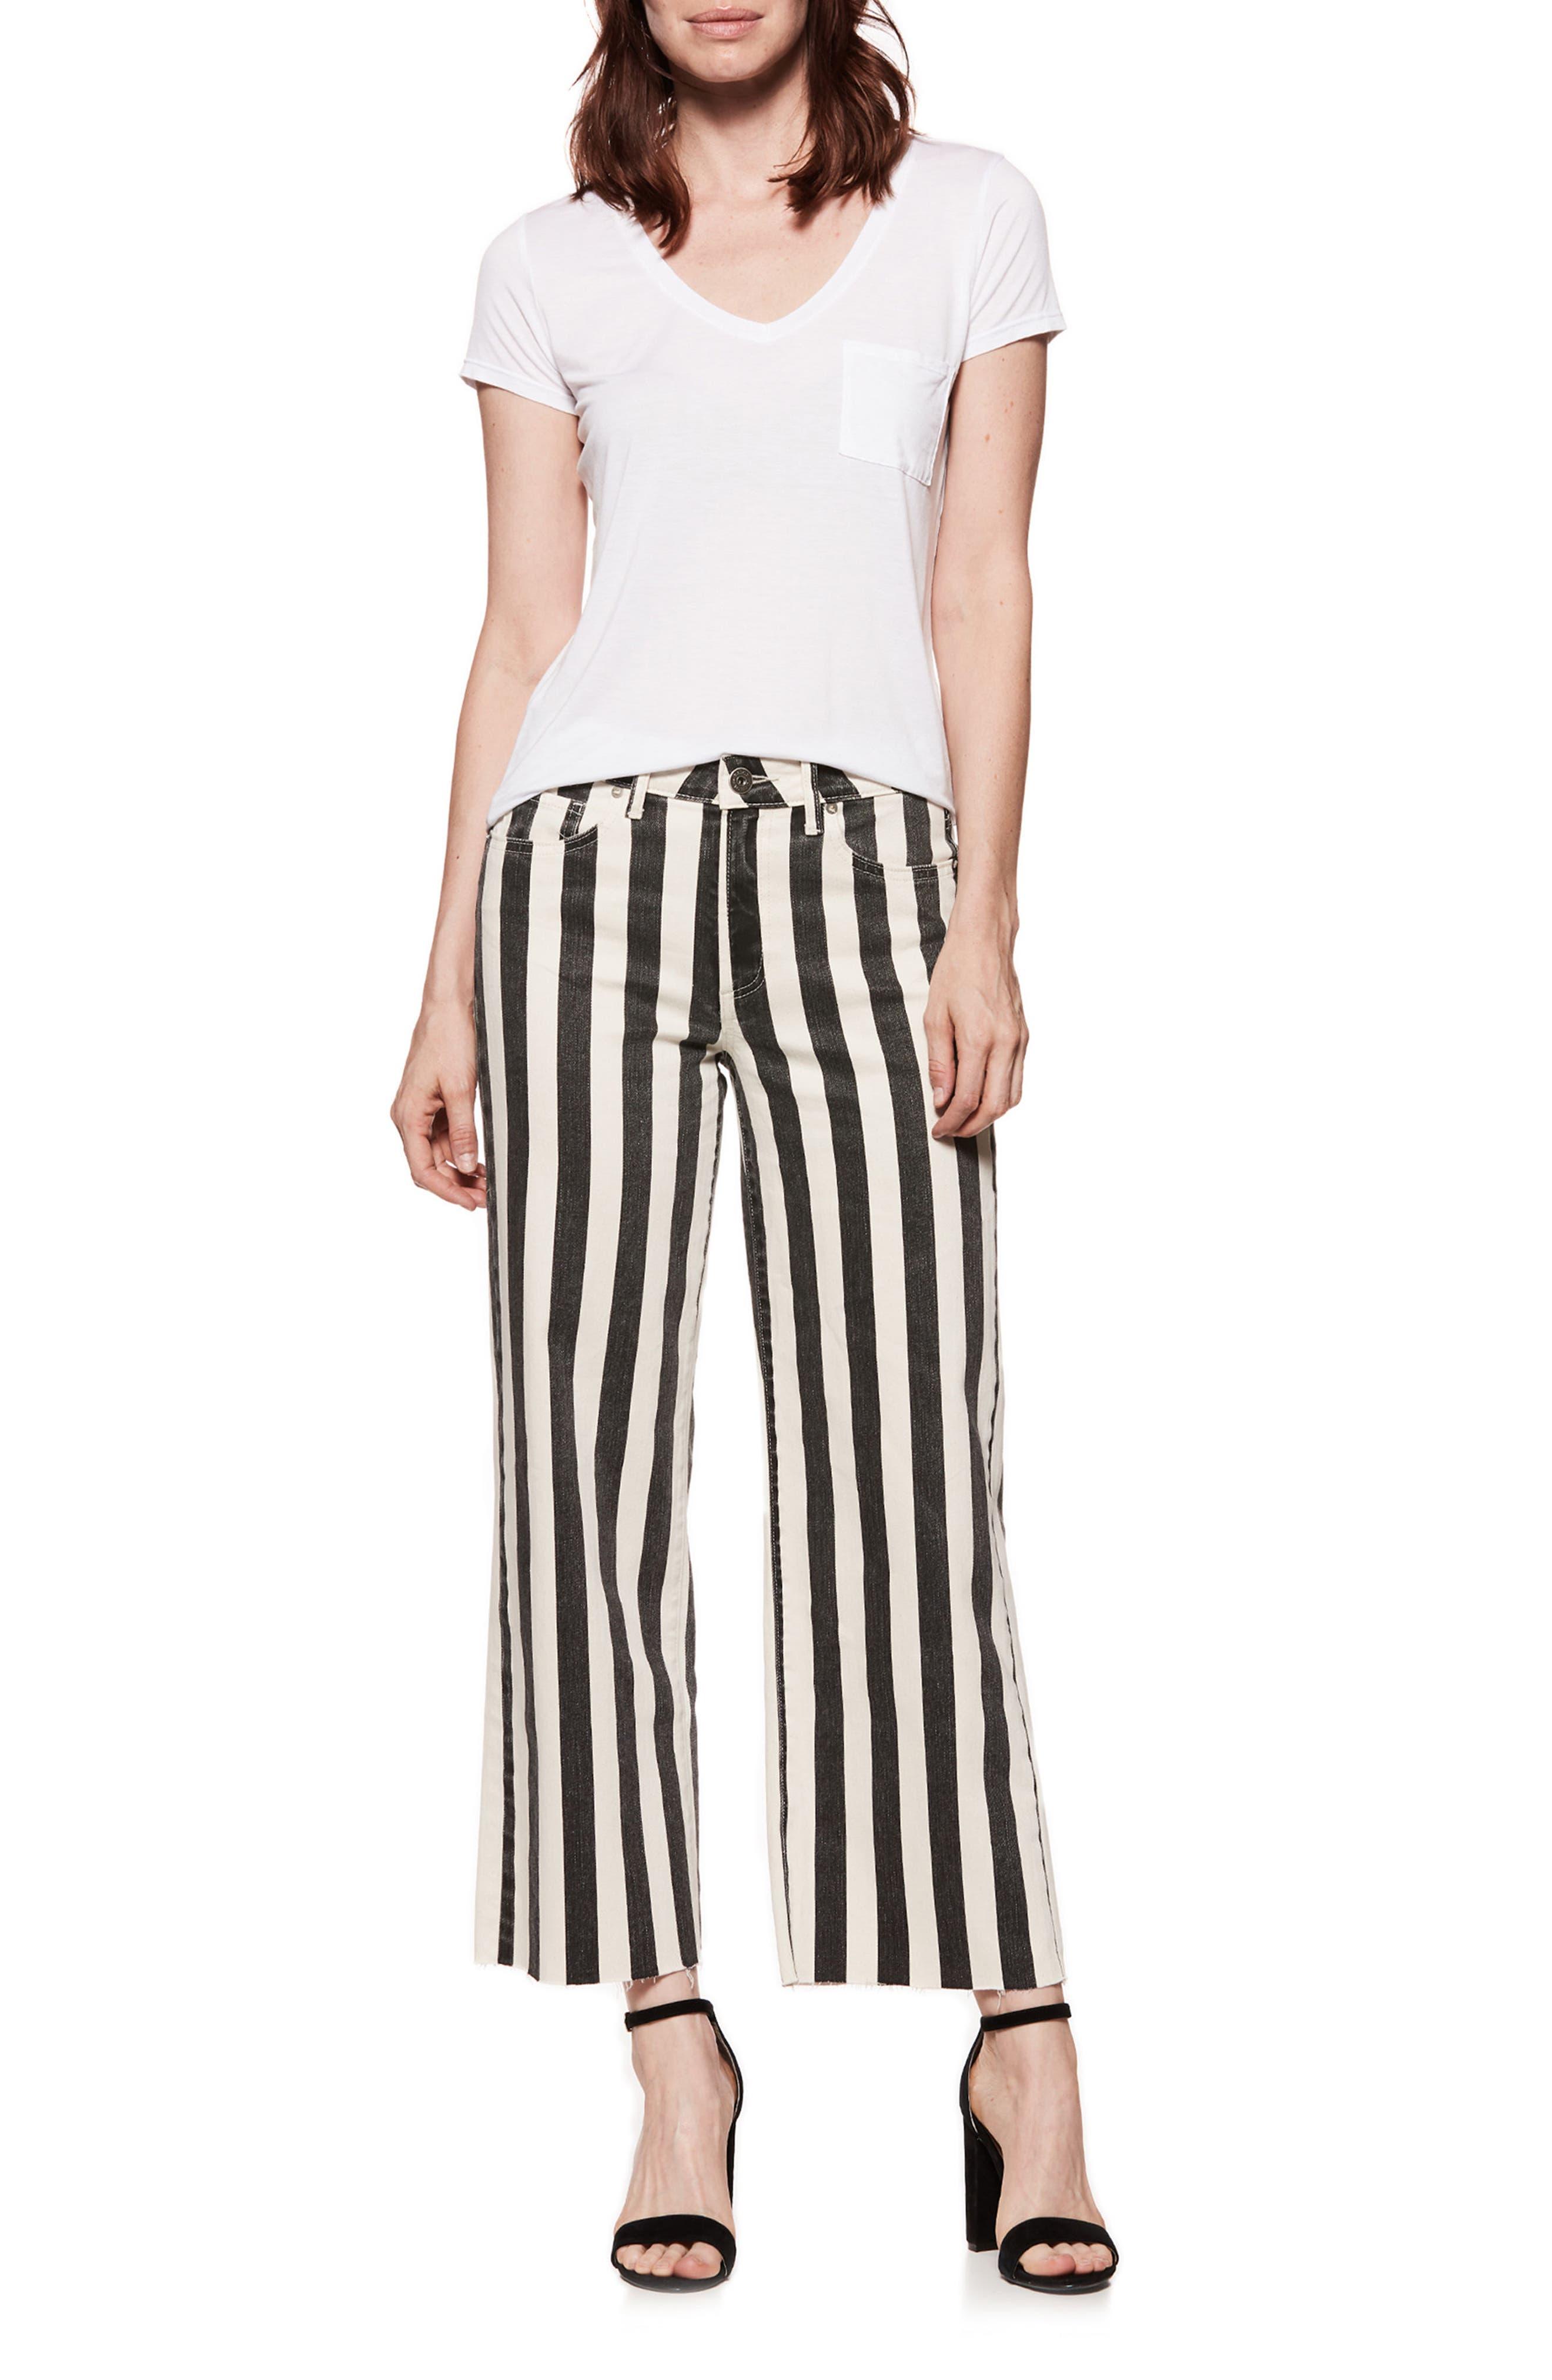 Nellie High Waist Culotte Jeans,                             Alternate thumbnail 2, color,                             Black/ Ecru Stripe